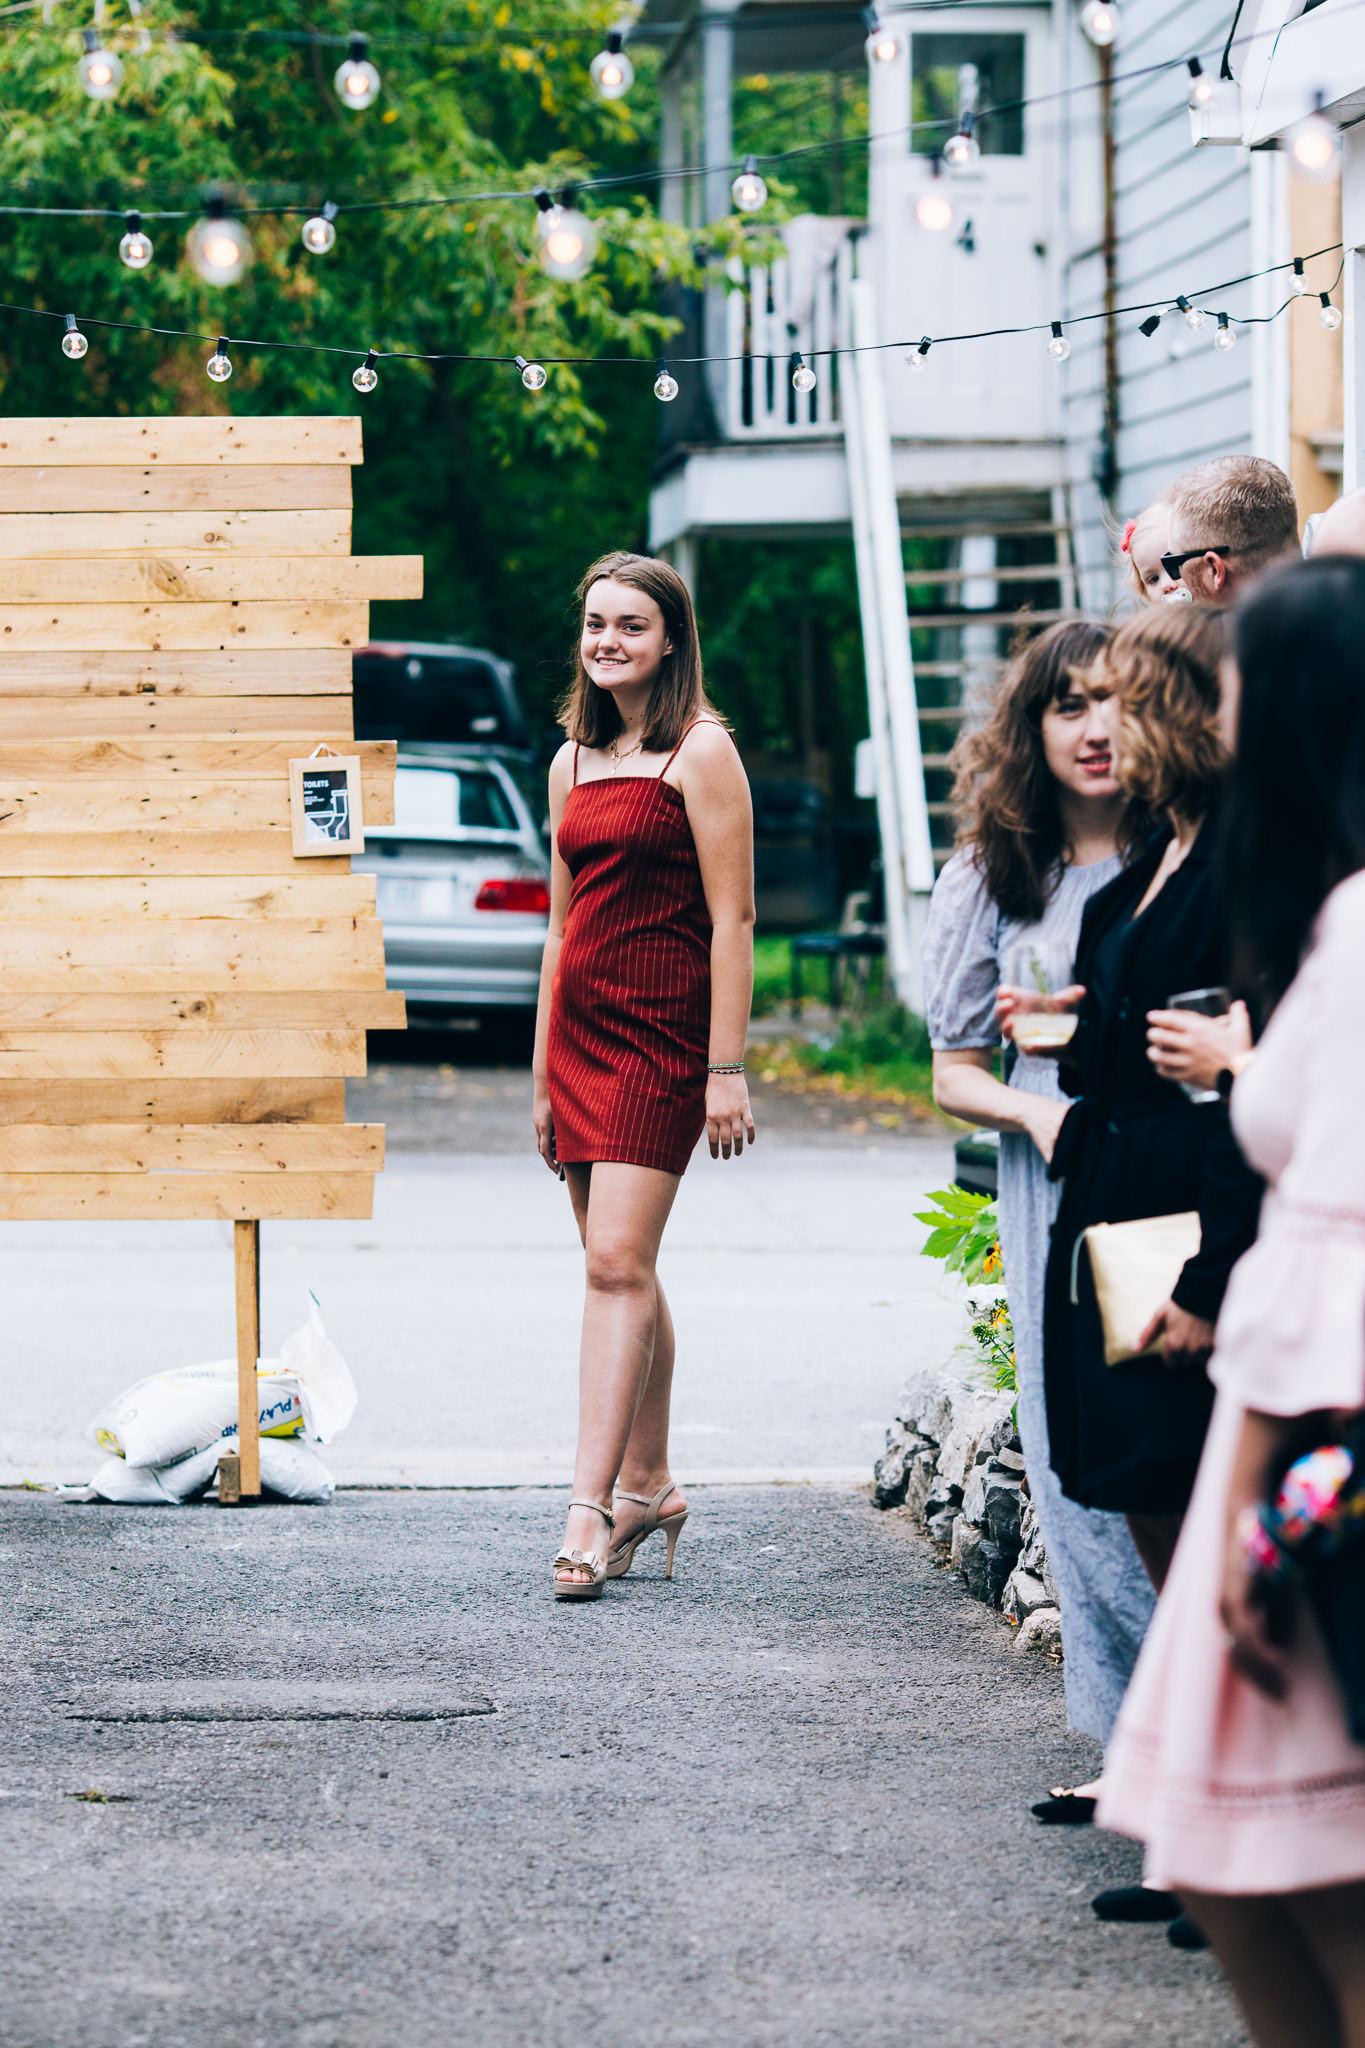 036_Canada-documentary-wedding-photograp